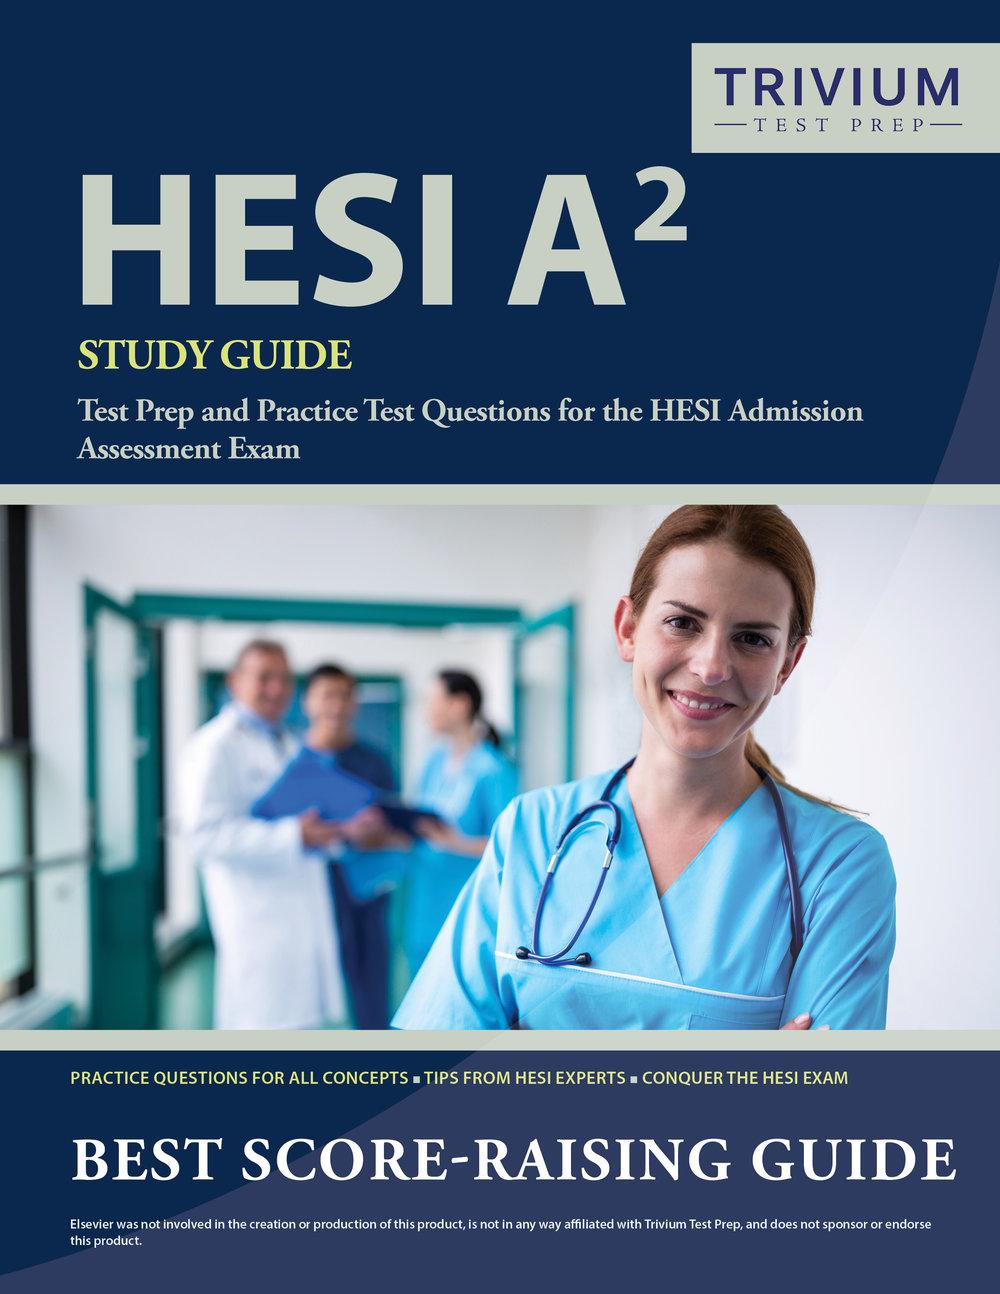 HESI_A2_cover_website-(1)-compressor.jpg